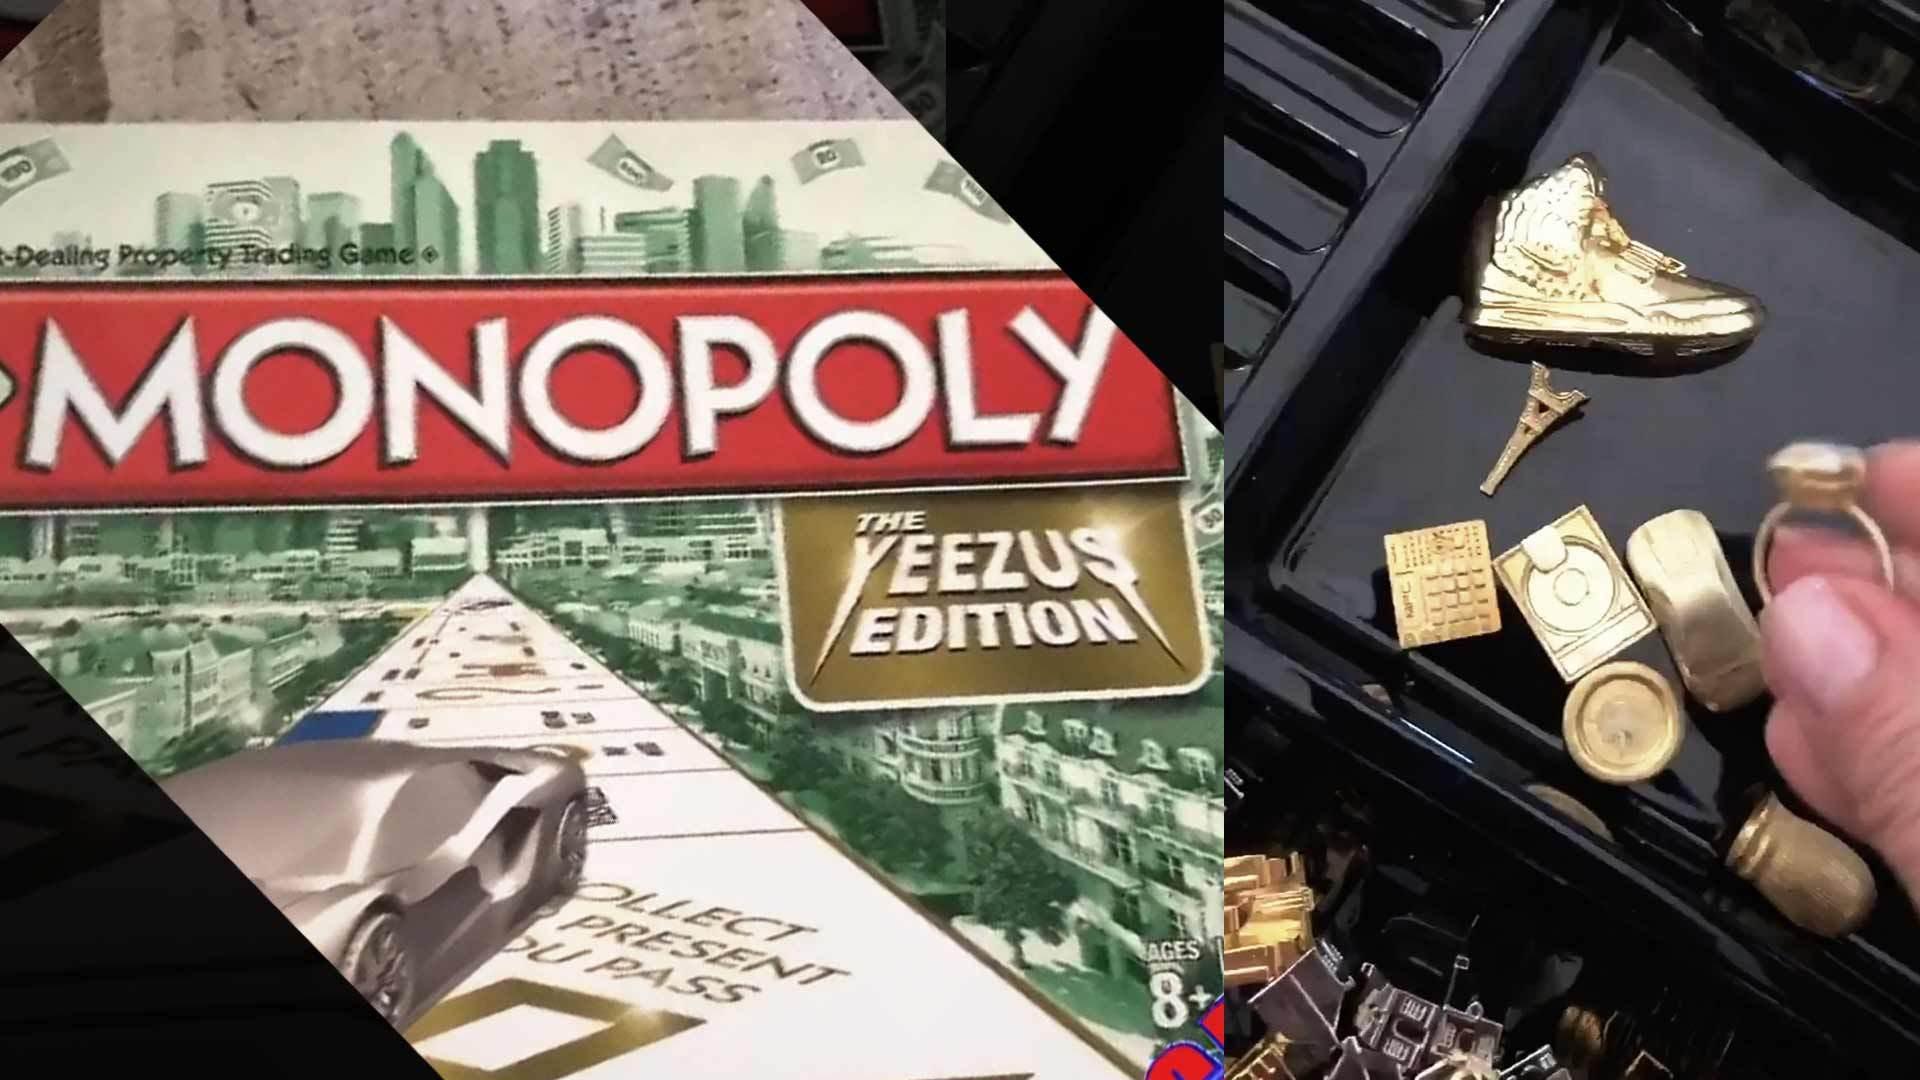 Kim Kardashian Gives Inside Look At The Custom YEEZUS Monopoly Game